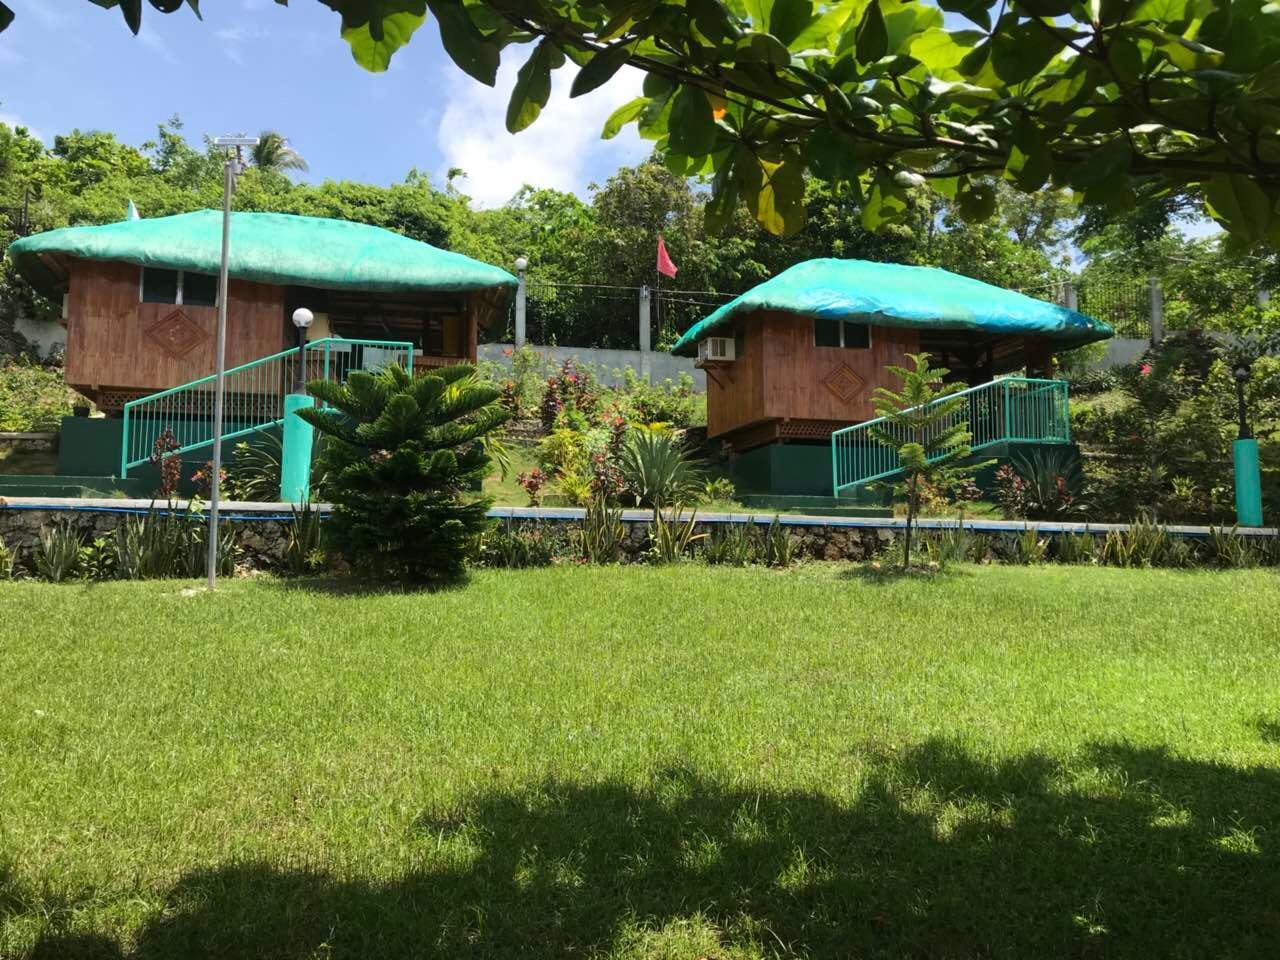 Camao Resorts